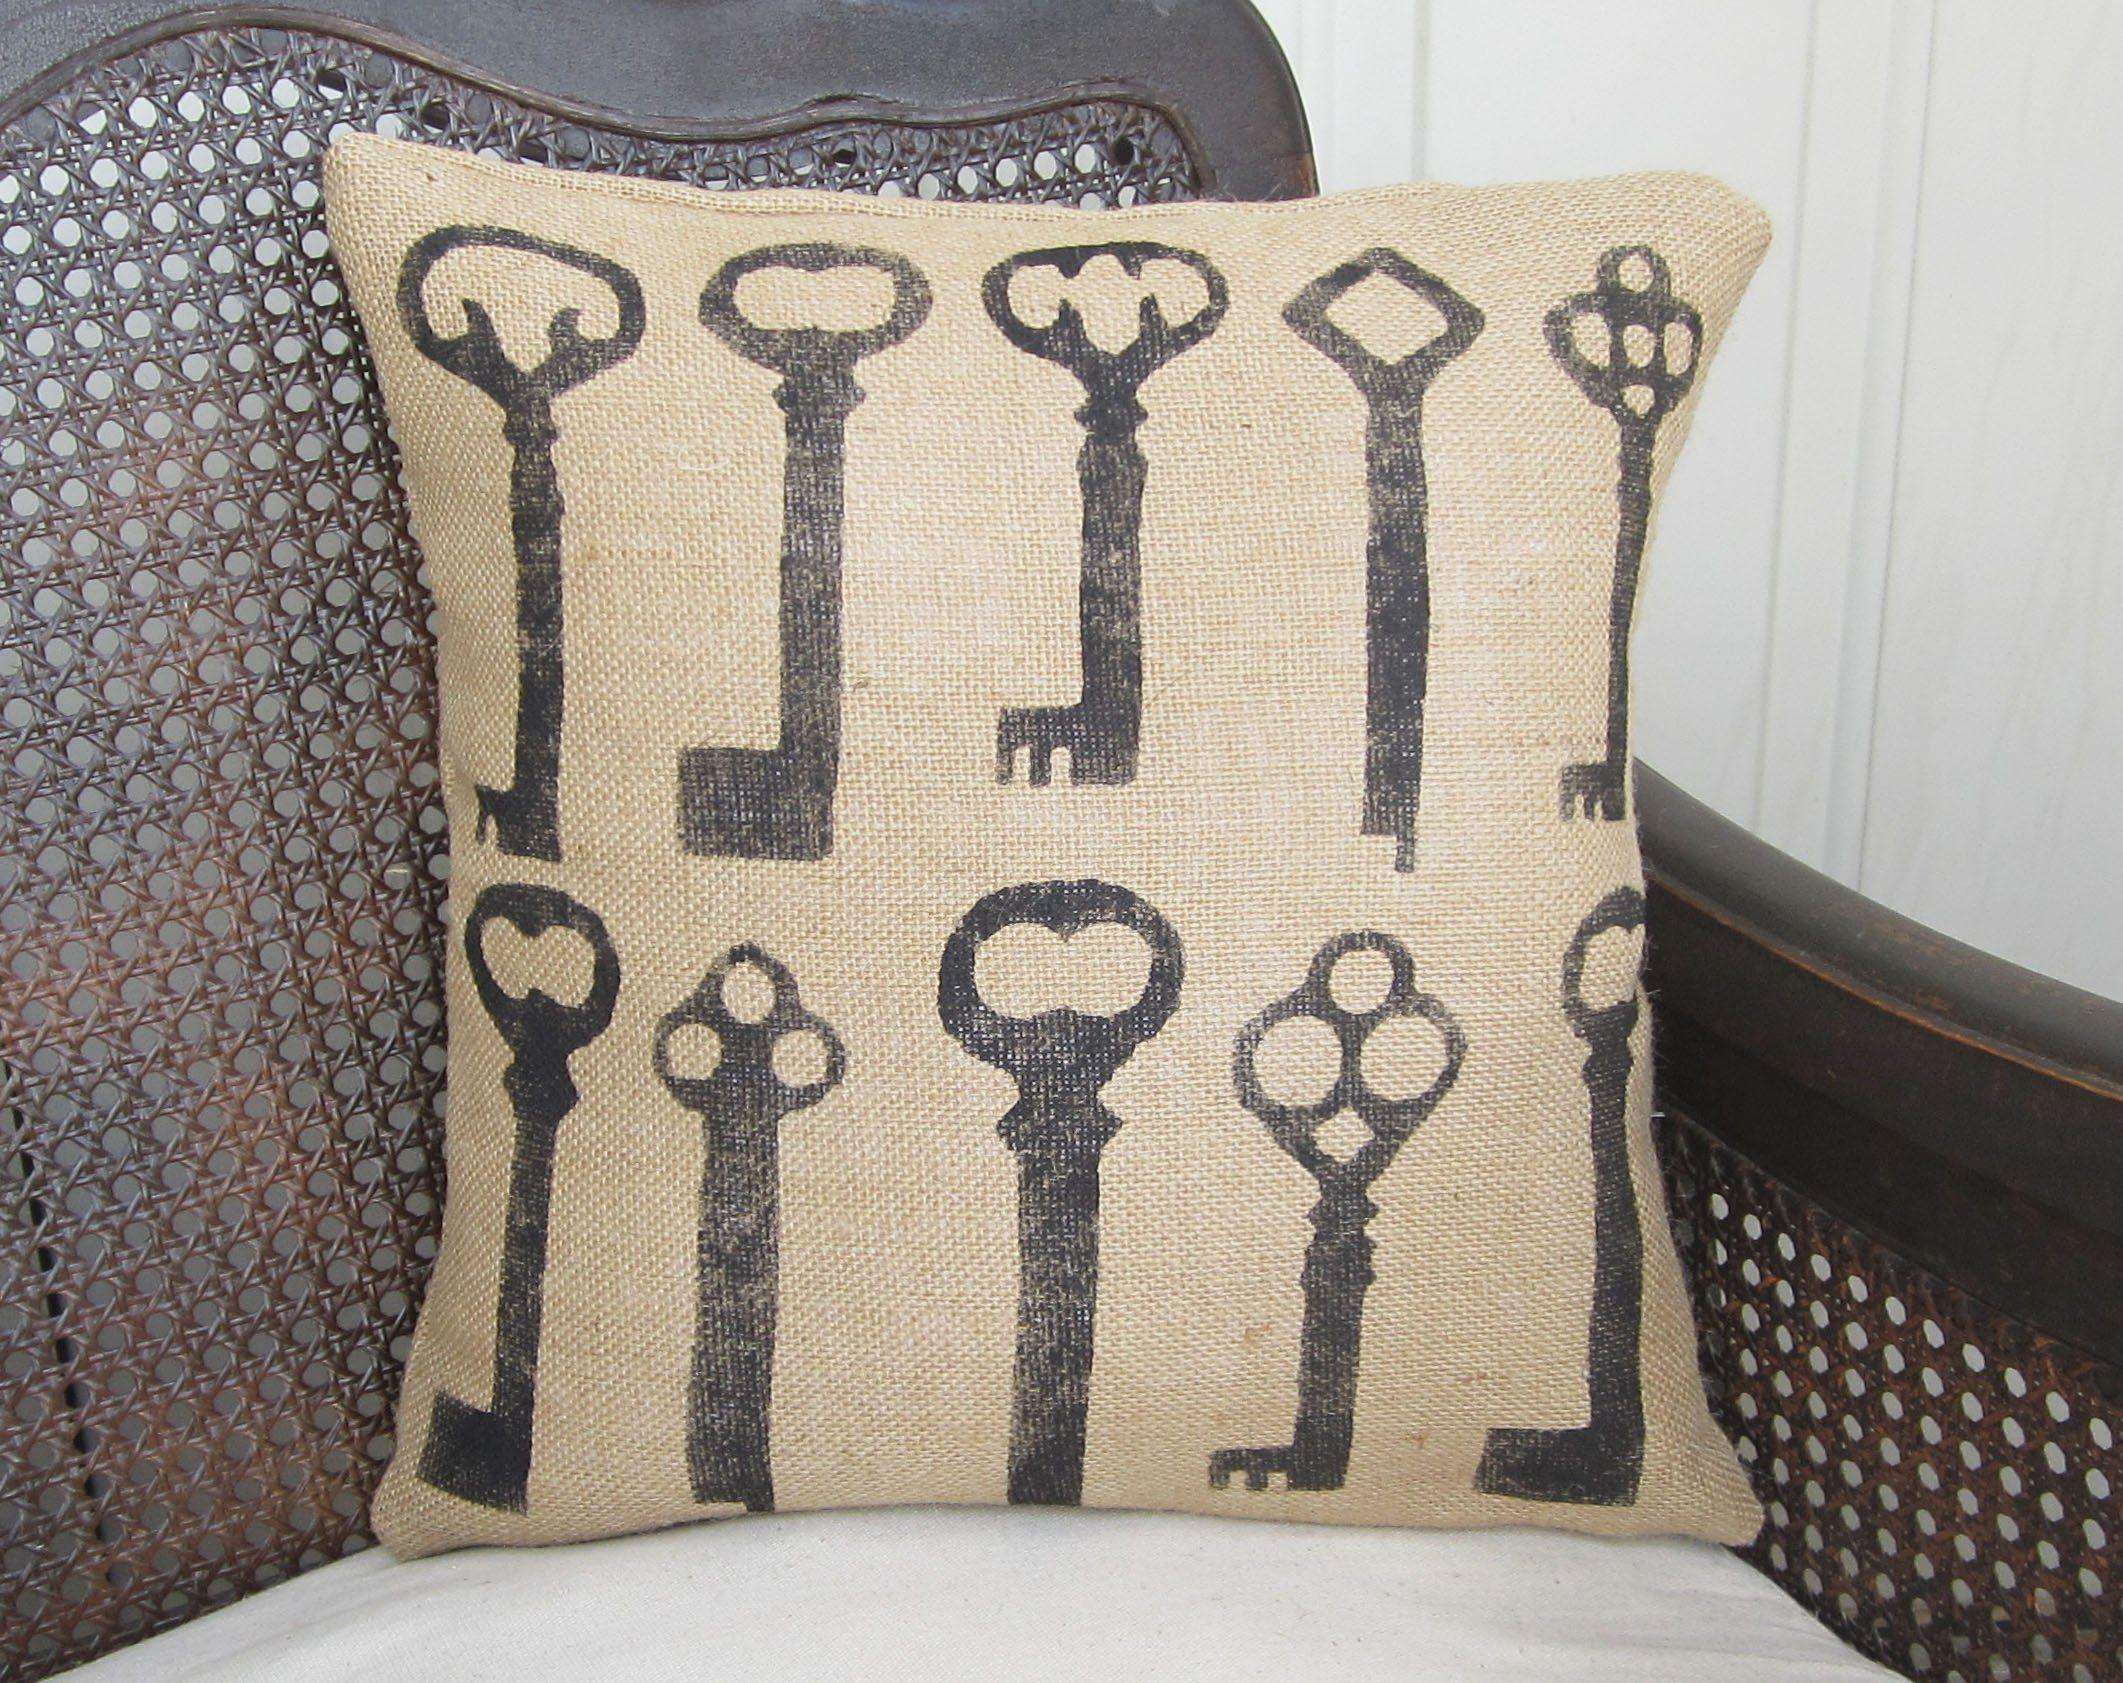 Skeleton Key - Burlap Pillow - 16x16 - Insert Included. This ...